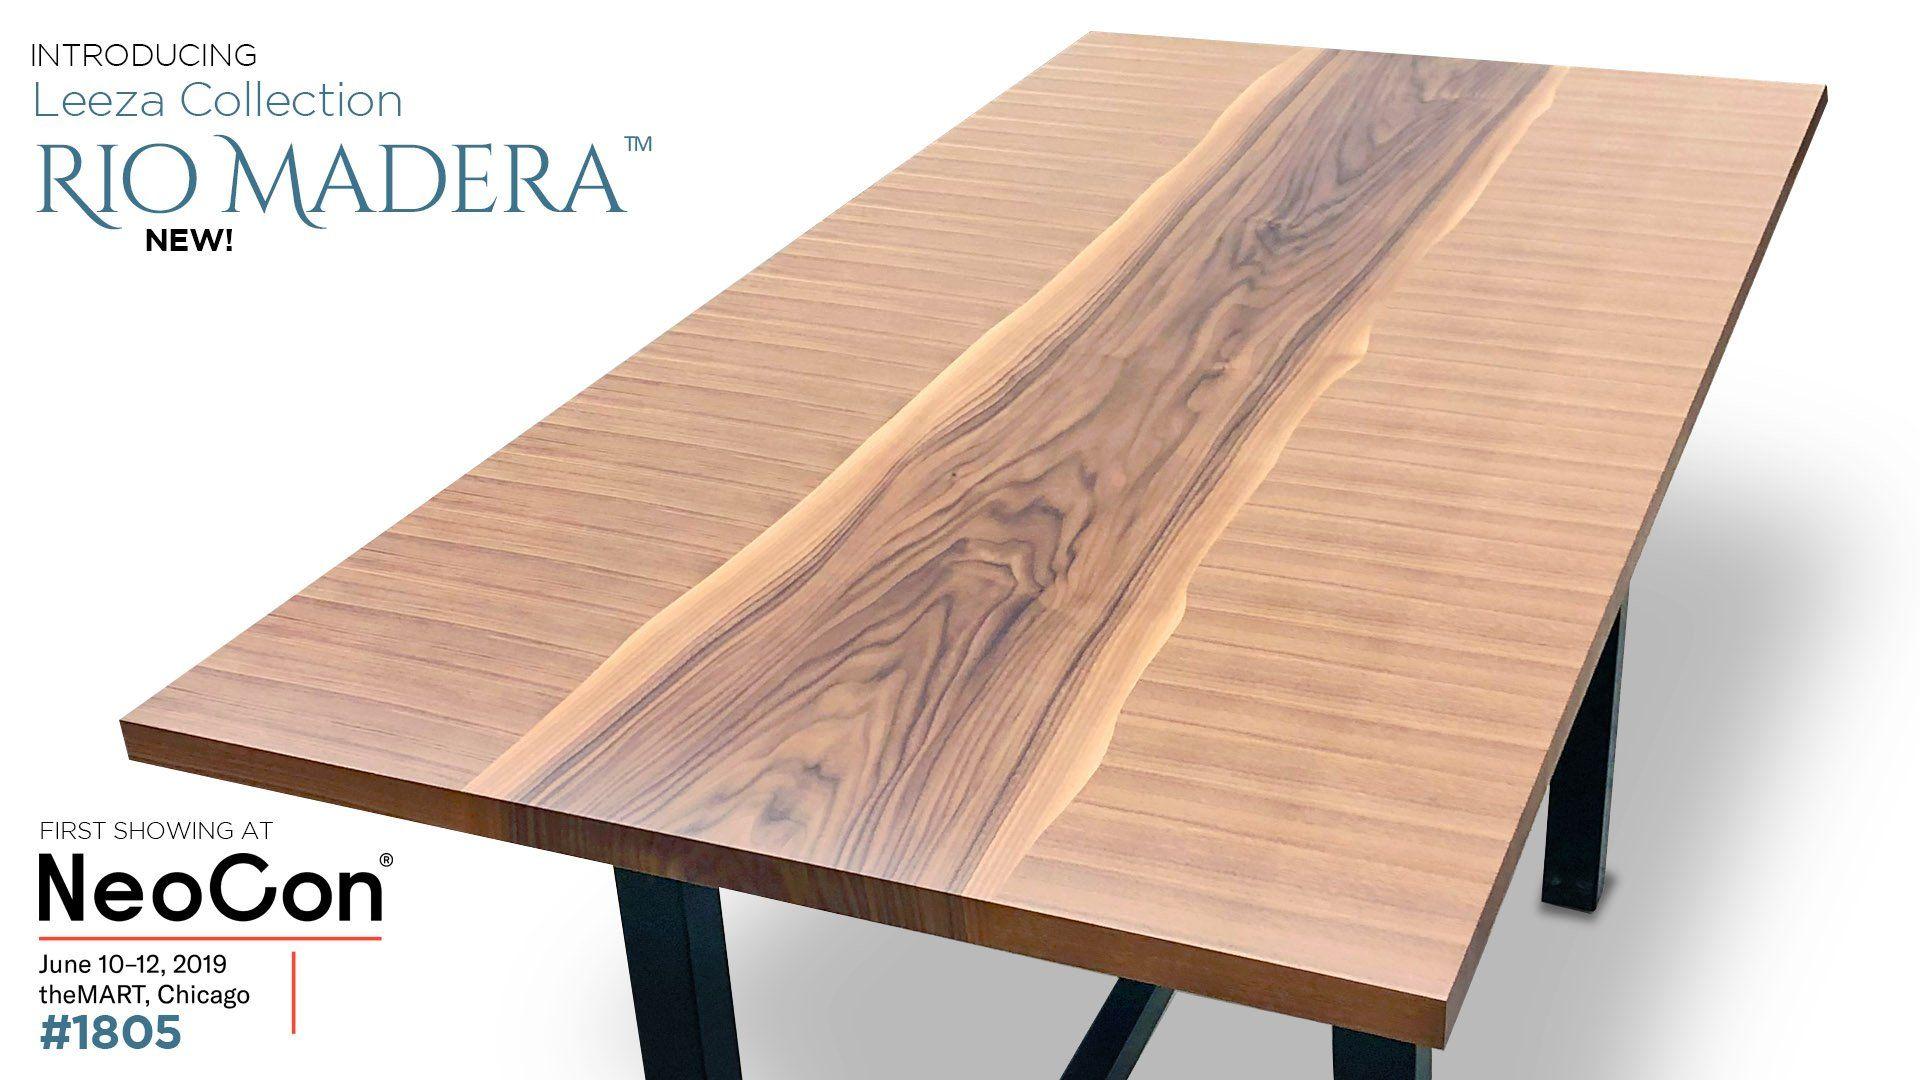 Leeza™ and Rio Madera™ Contemporary Tables  Contemporary